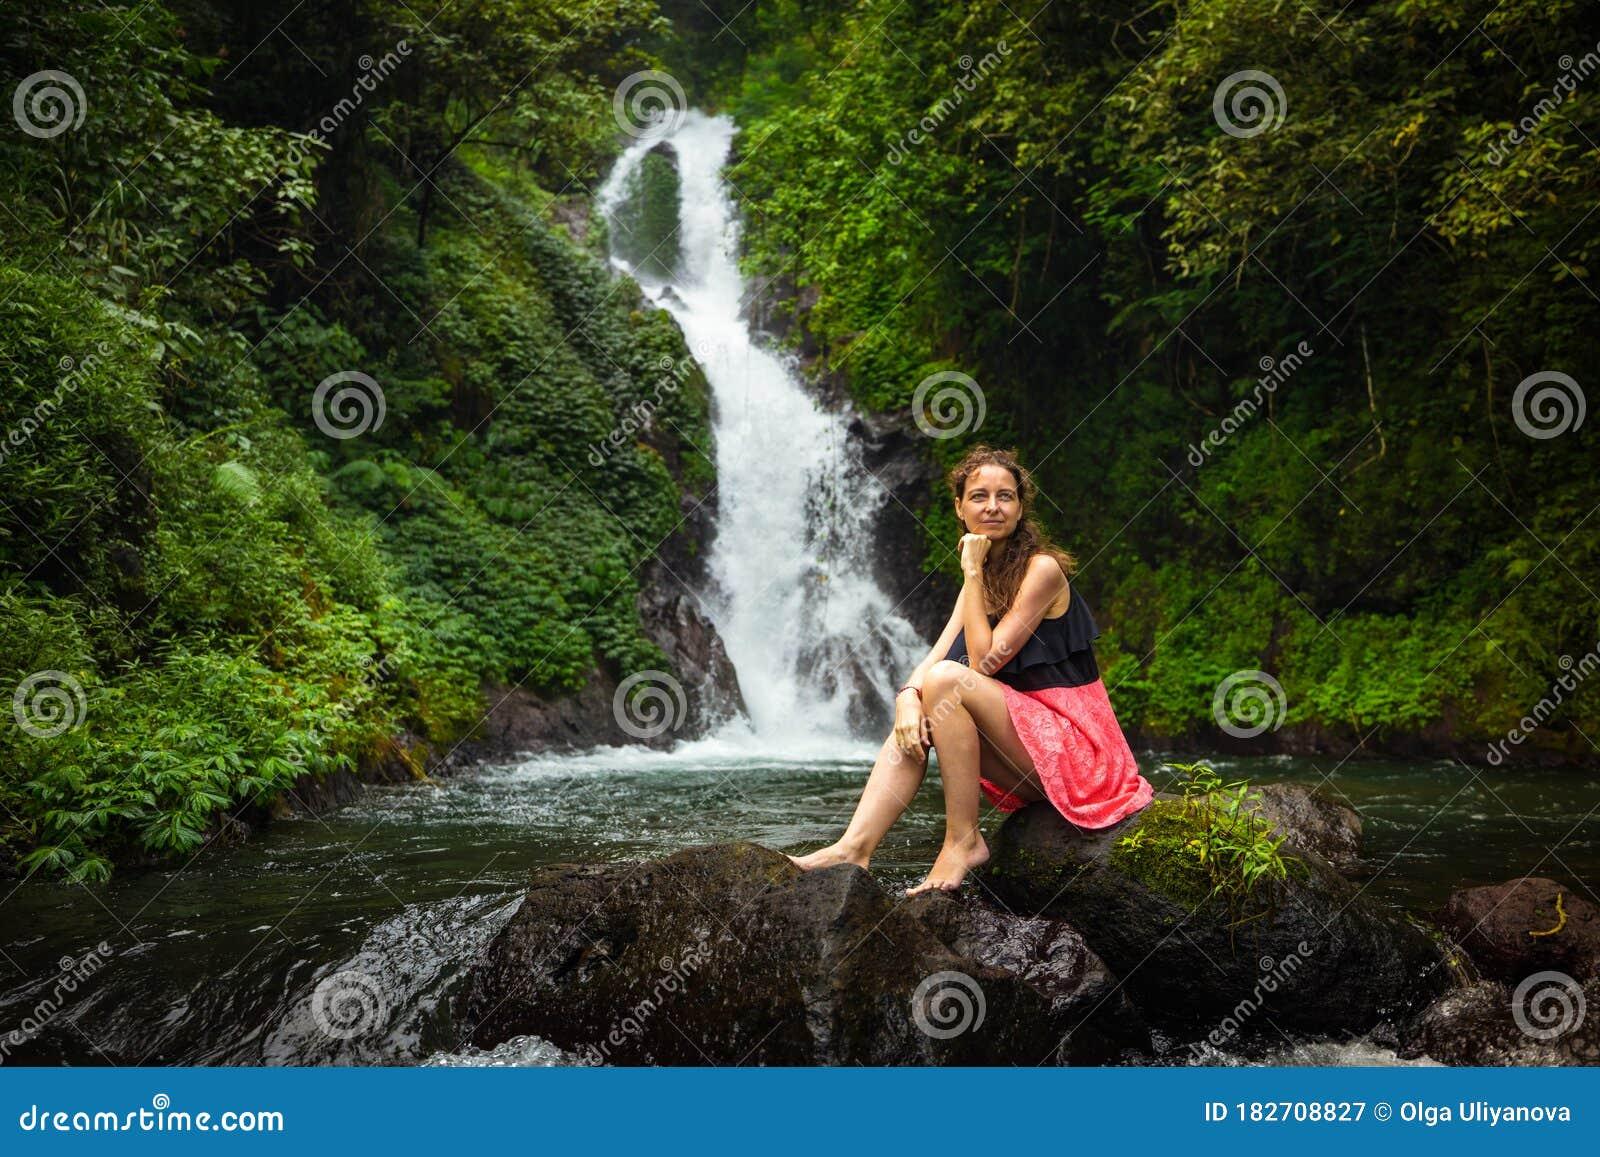 Dutch Woman Sitting On Rock Near Waterfall Stock Image